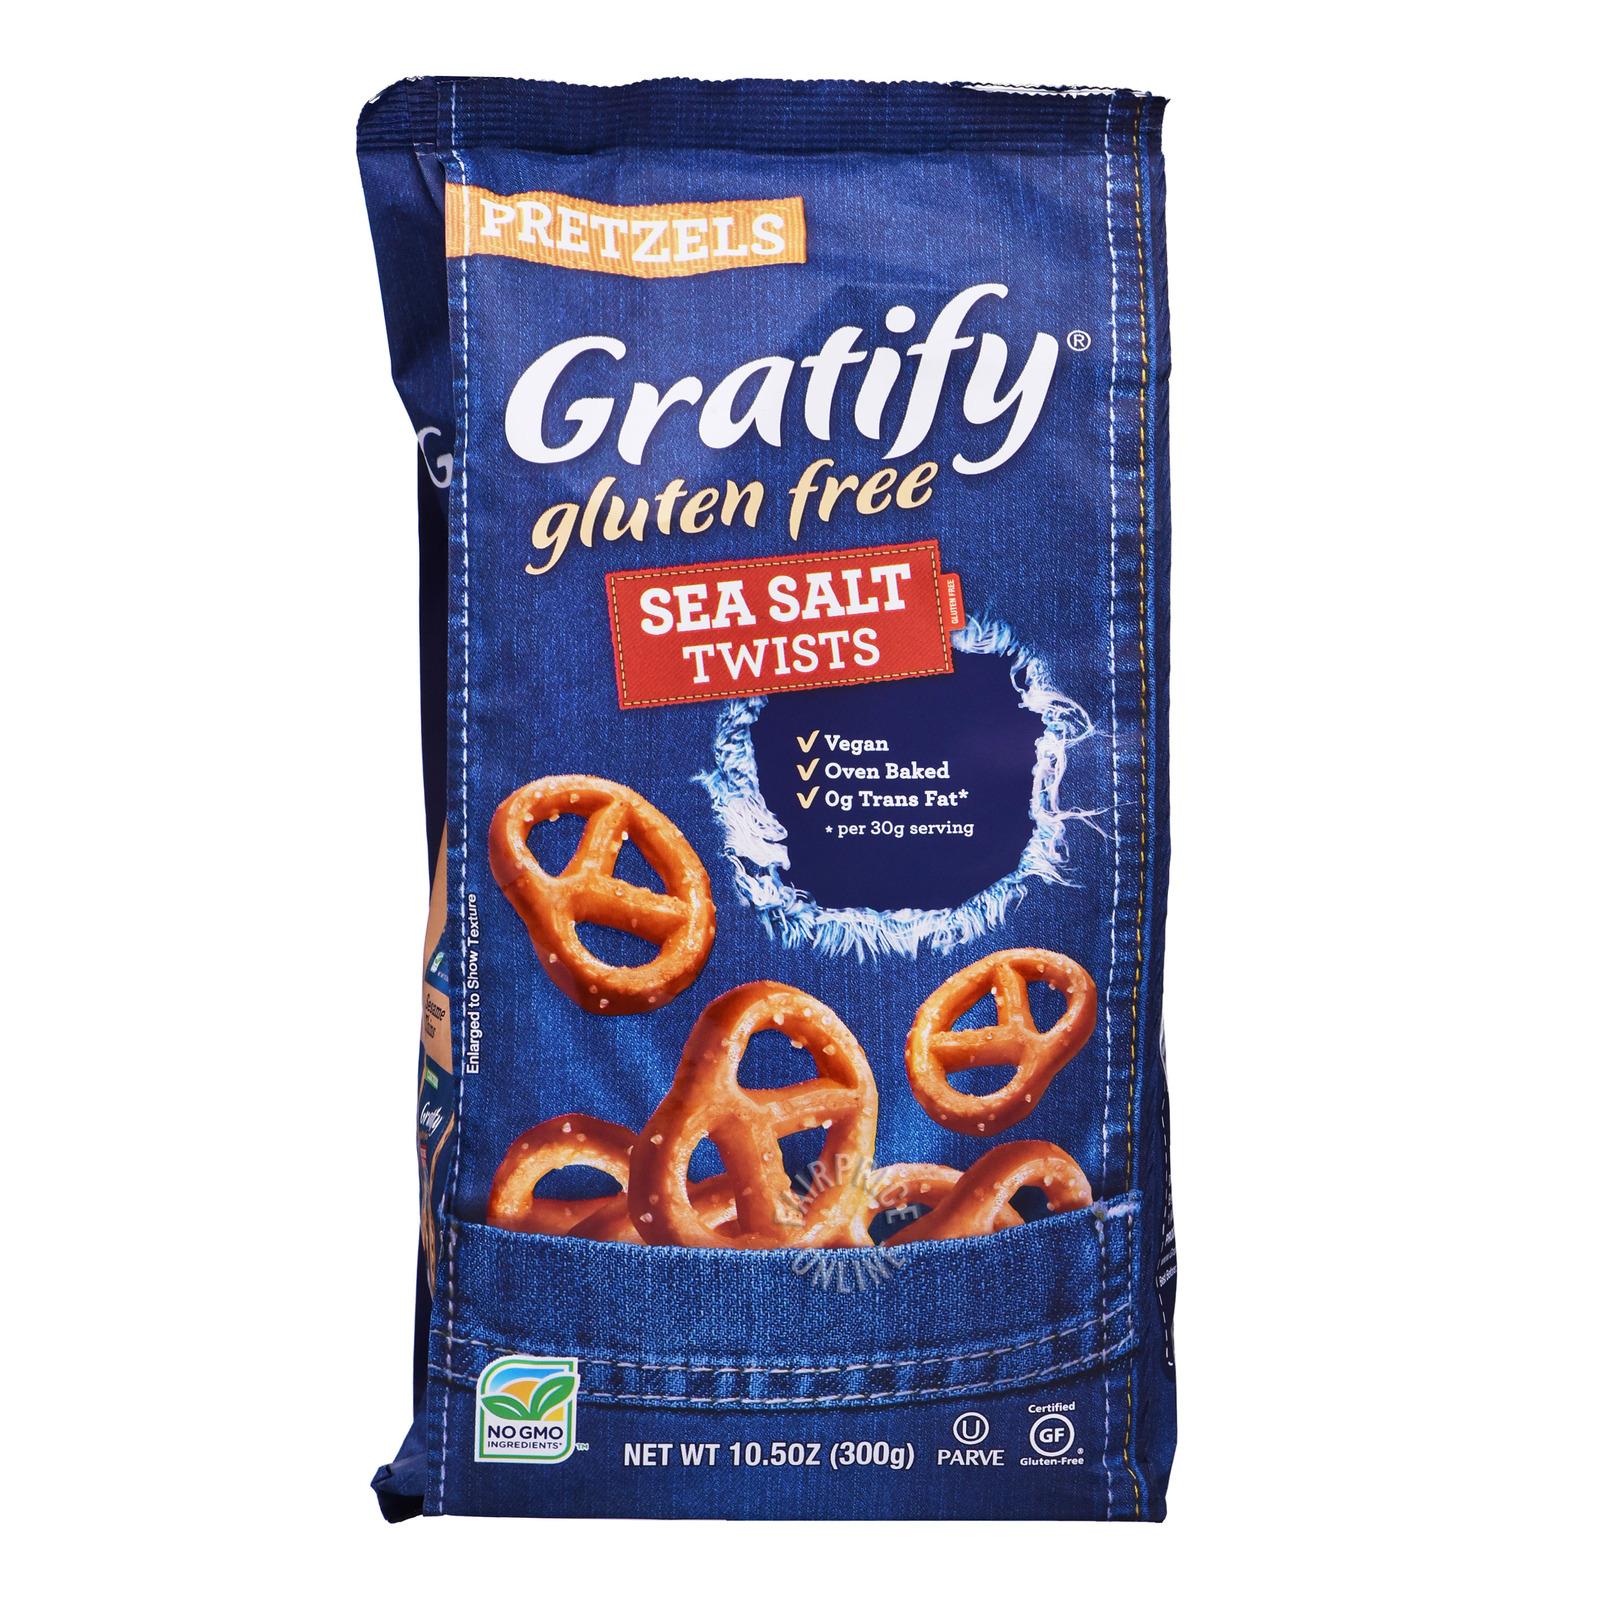 Gratify Pretzels - Sea Salt (Twist)